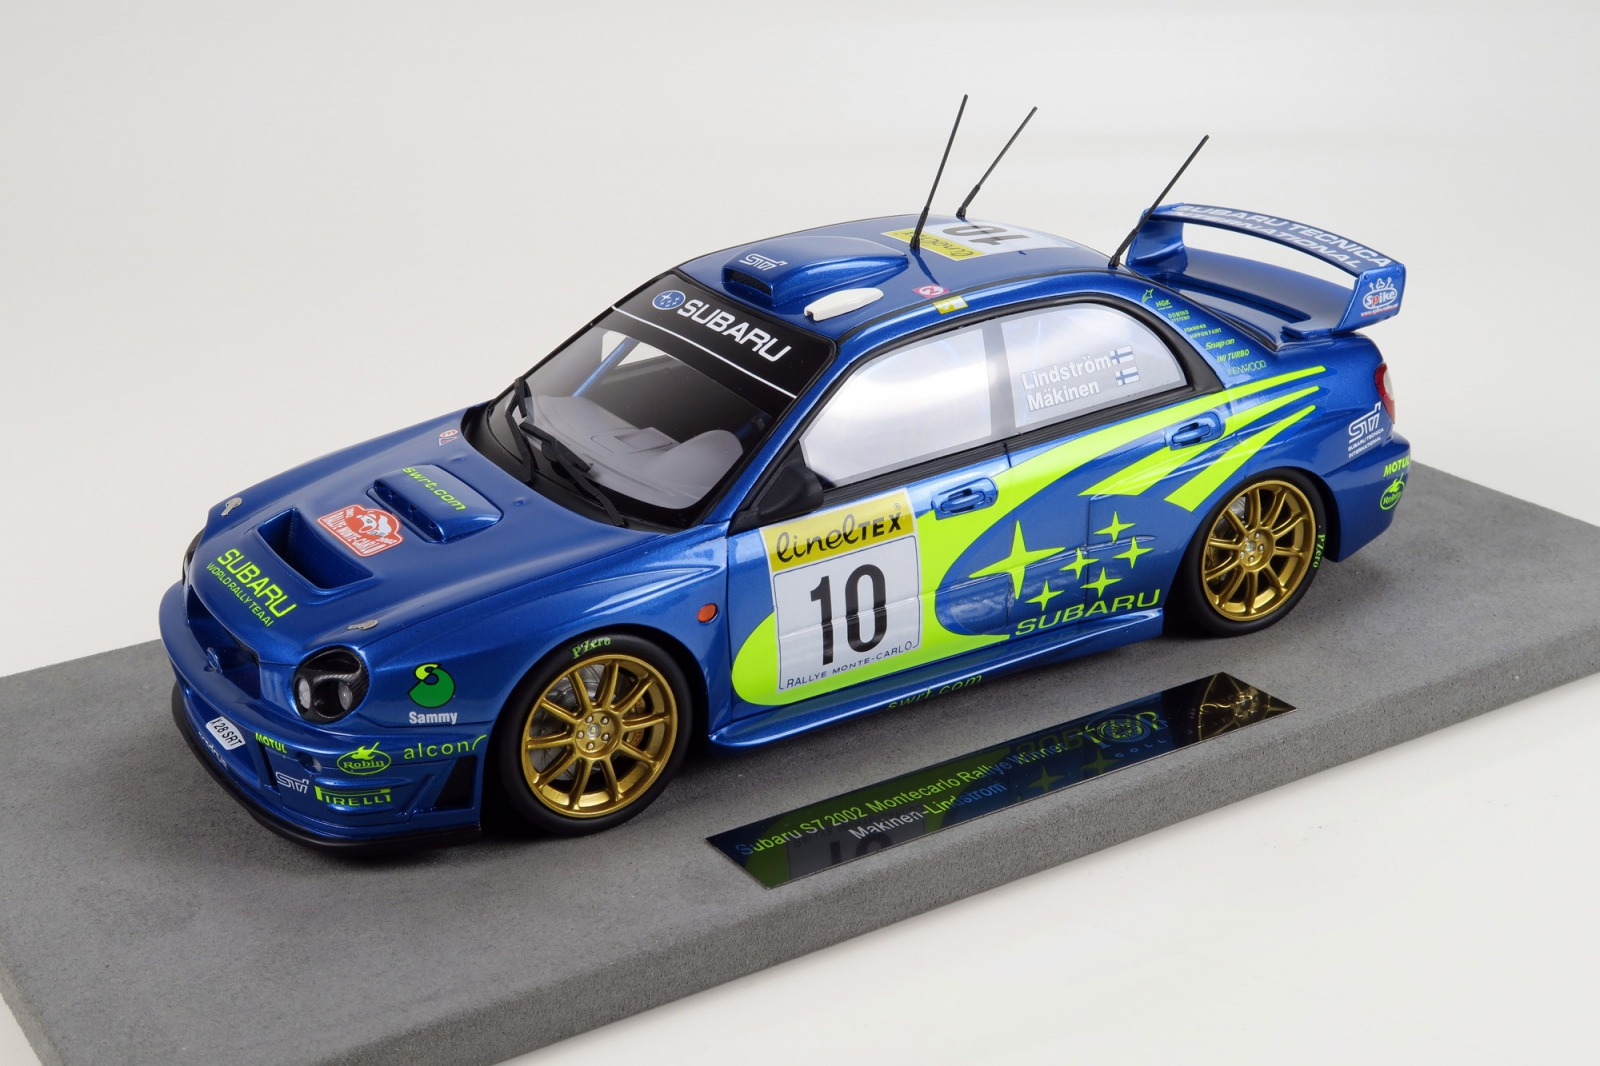 Topmarques 1:18 2002年ラリーモンテカルロ優勝モデル スバル インプレッサ S7 NO.10SUBARU - IMPREZA S7 N 10 WINNER RALLY MONTECARLO 2002 T.MAKINEN - K.LINDSTROM 1/18 by Topmarques